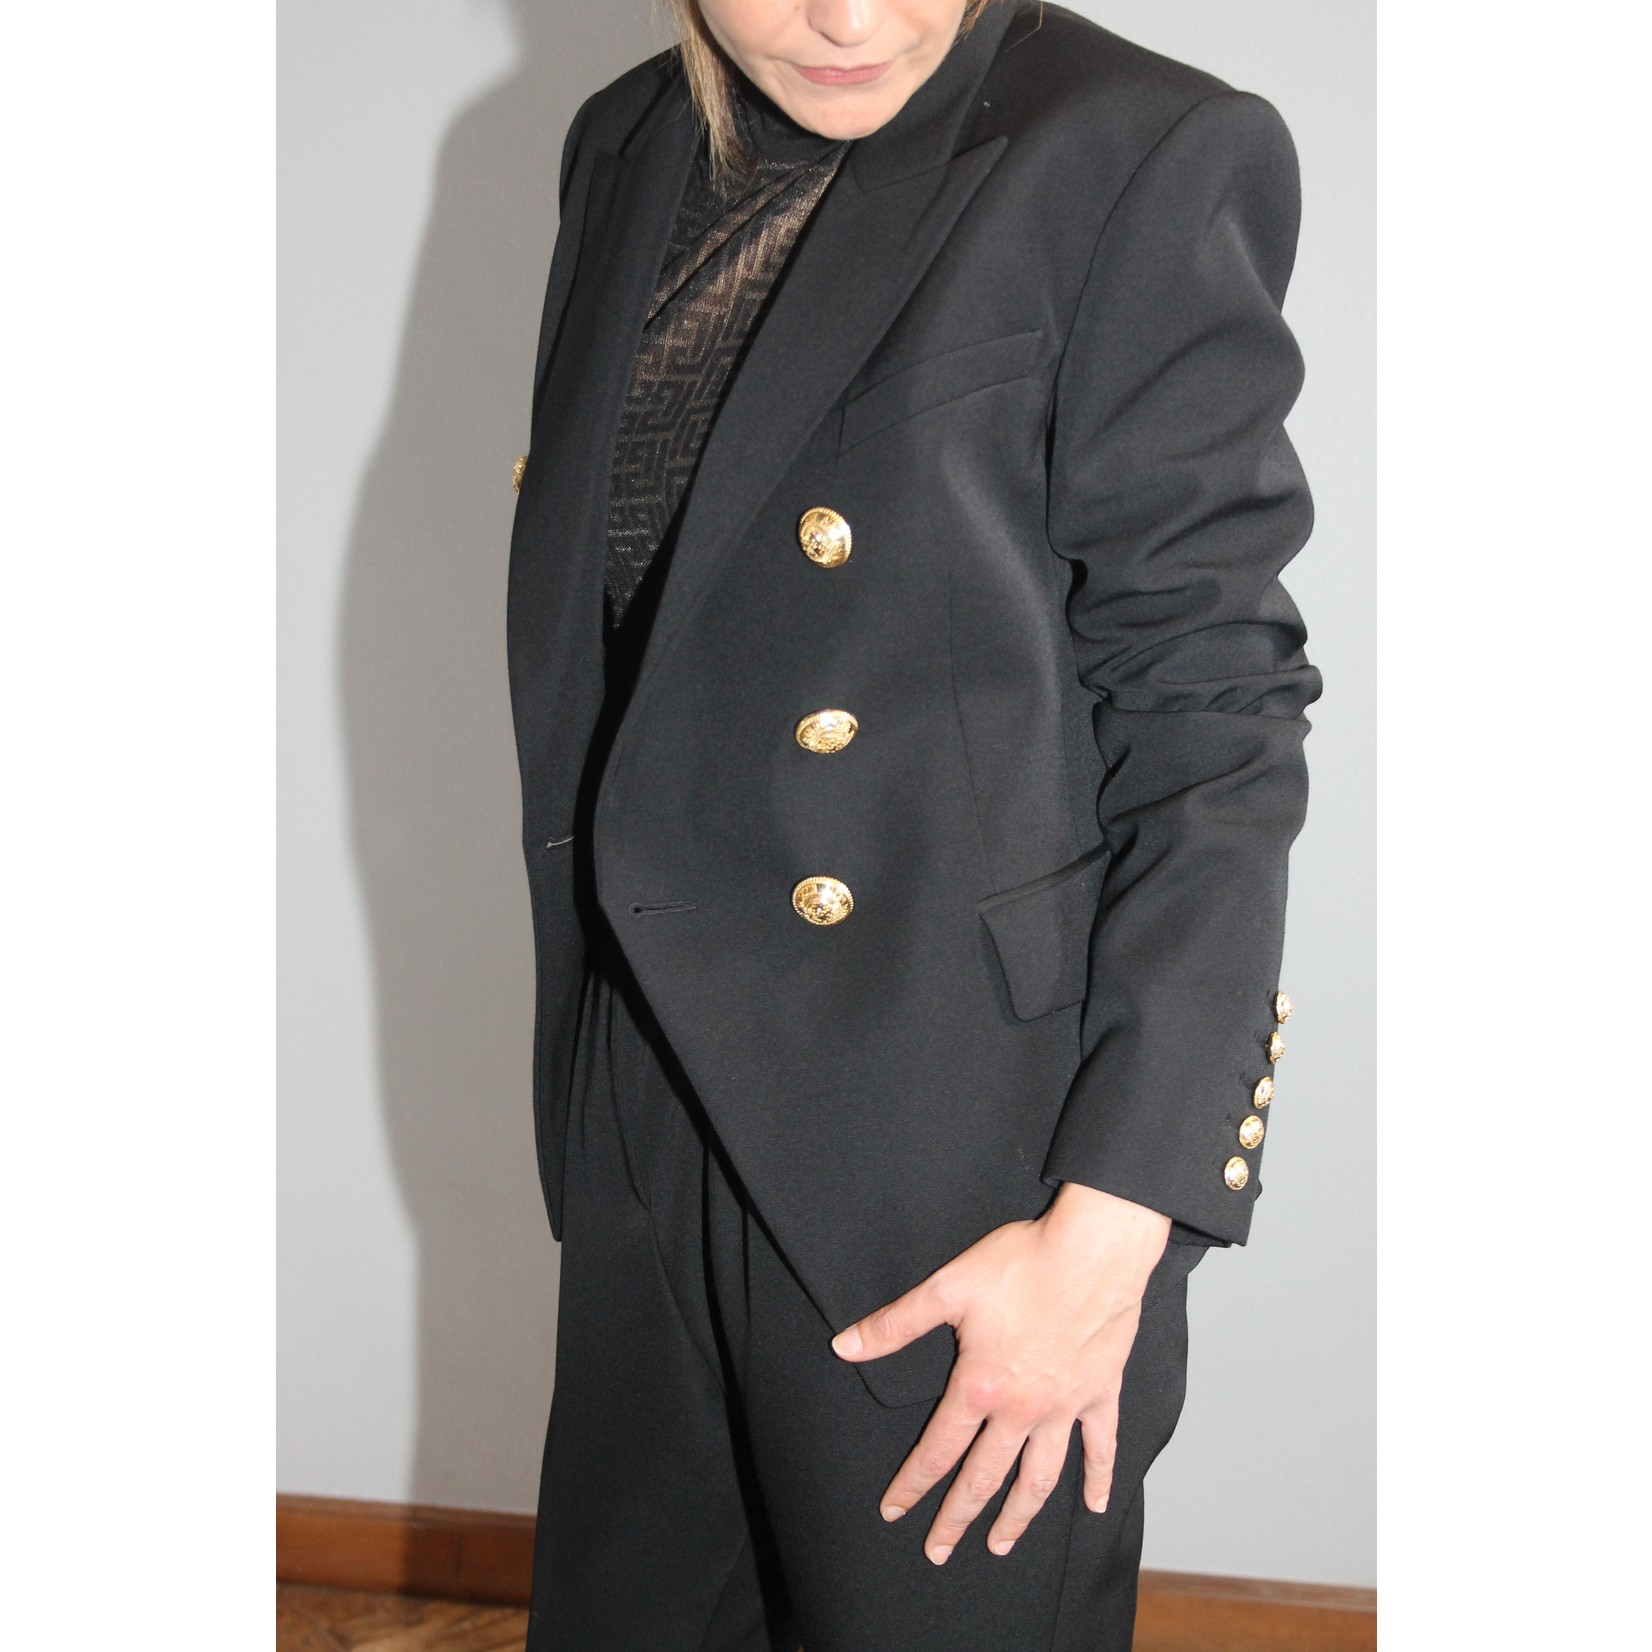 BALMAIN Vest 42795